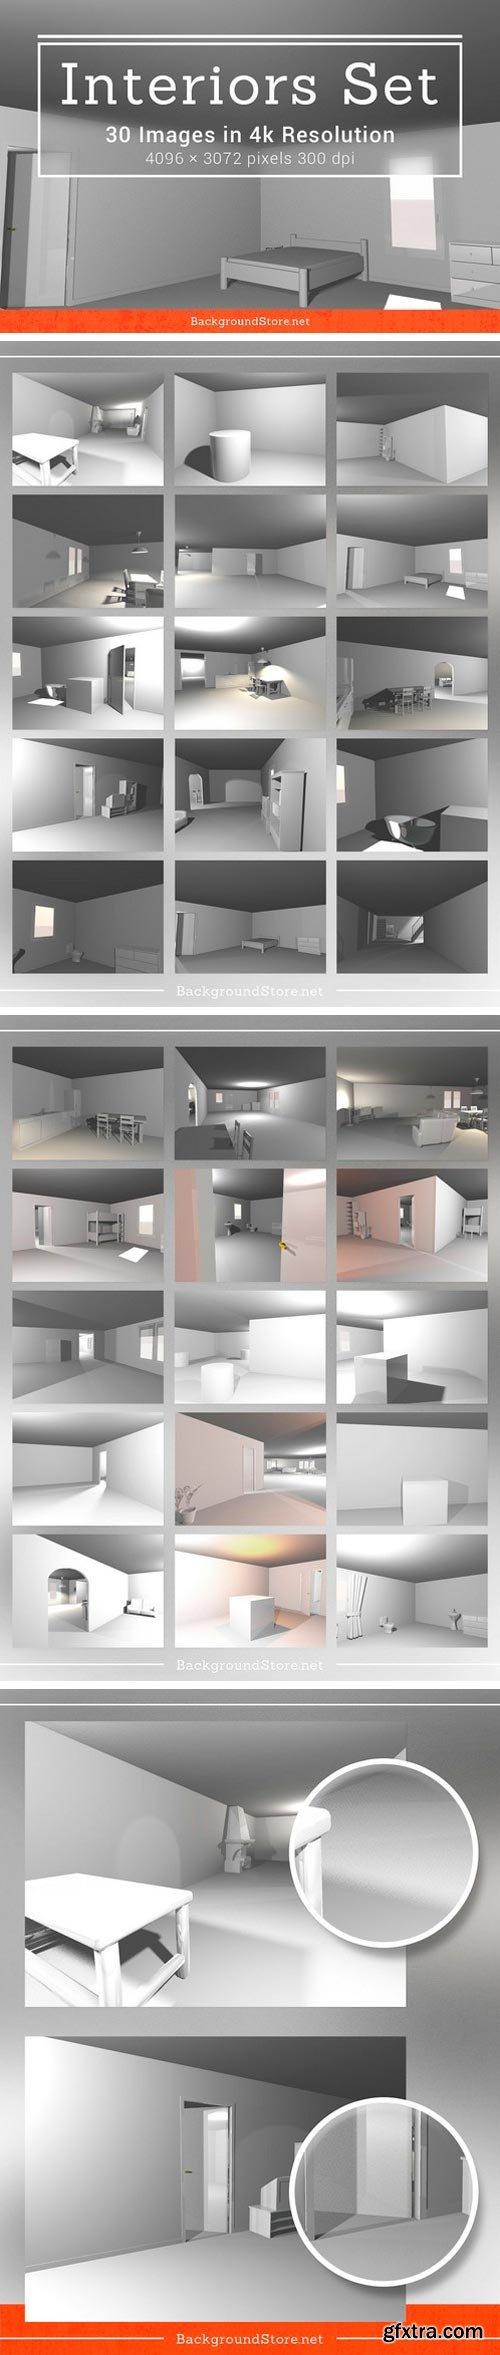 White Interiors Backgrounds Set 584954